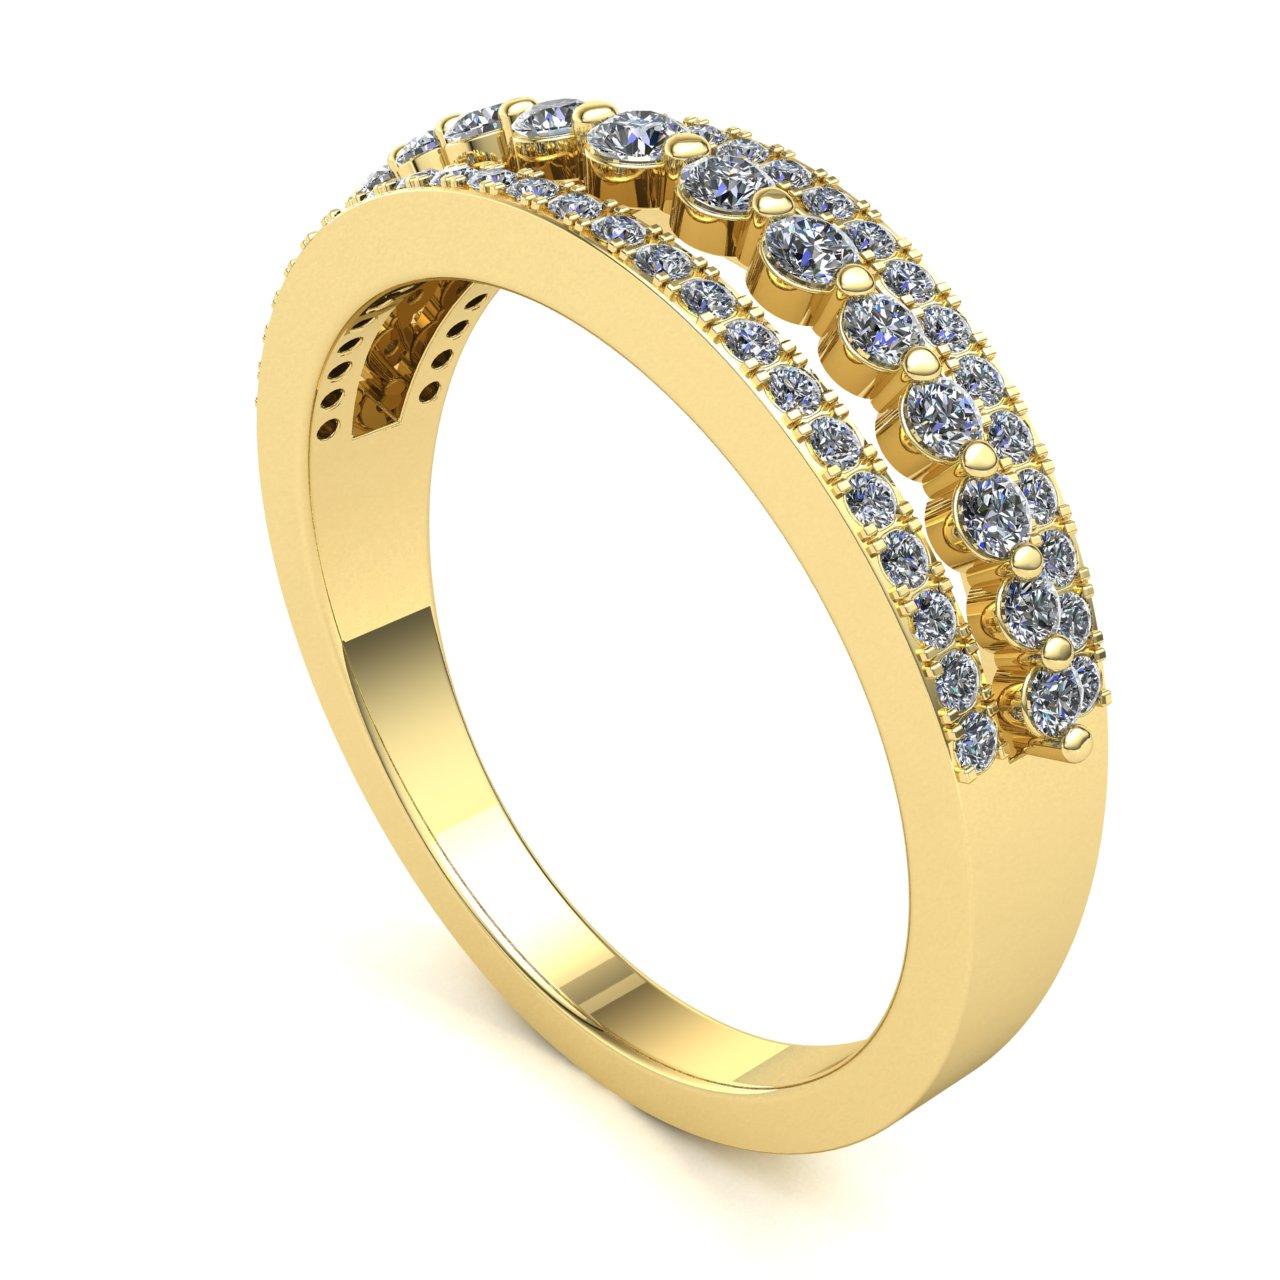 Genuine-0-5ctw-Round-Cut-Diamond-Ladies-Accent-Anniversary-Wedding-Band-10K-Gold thumbnail 13